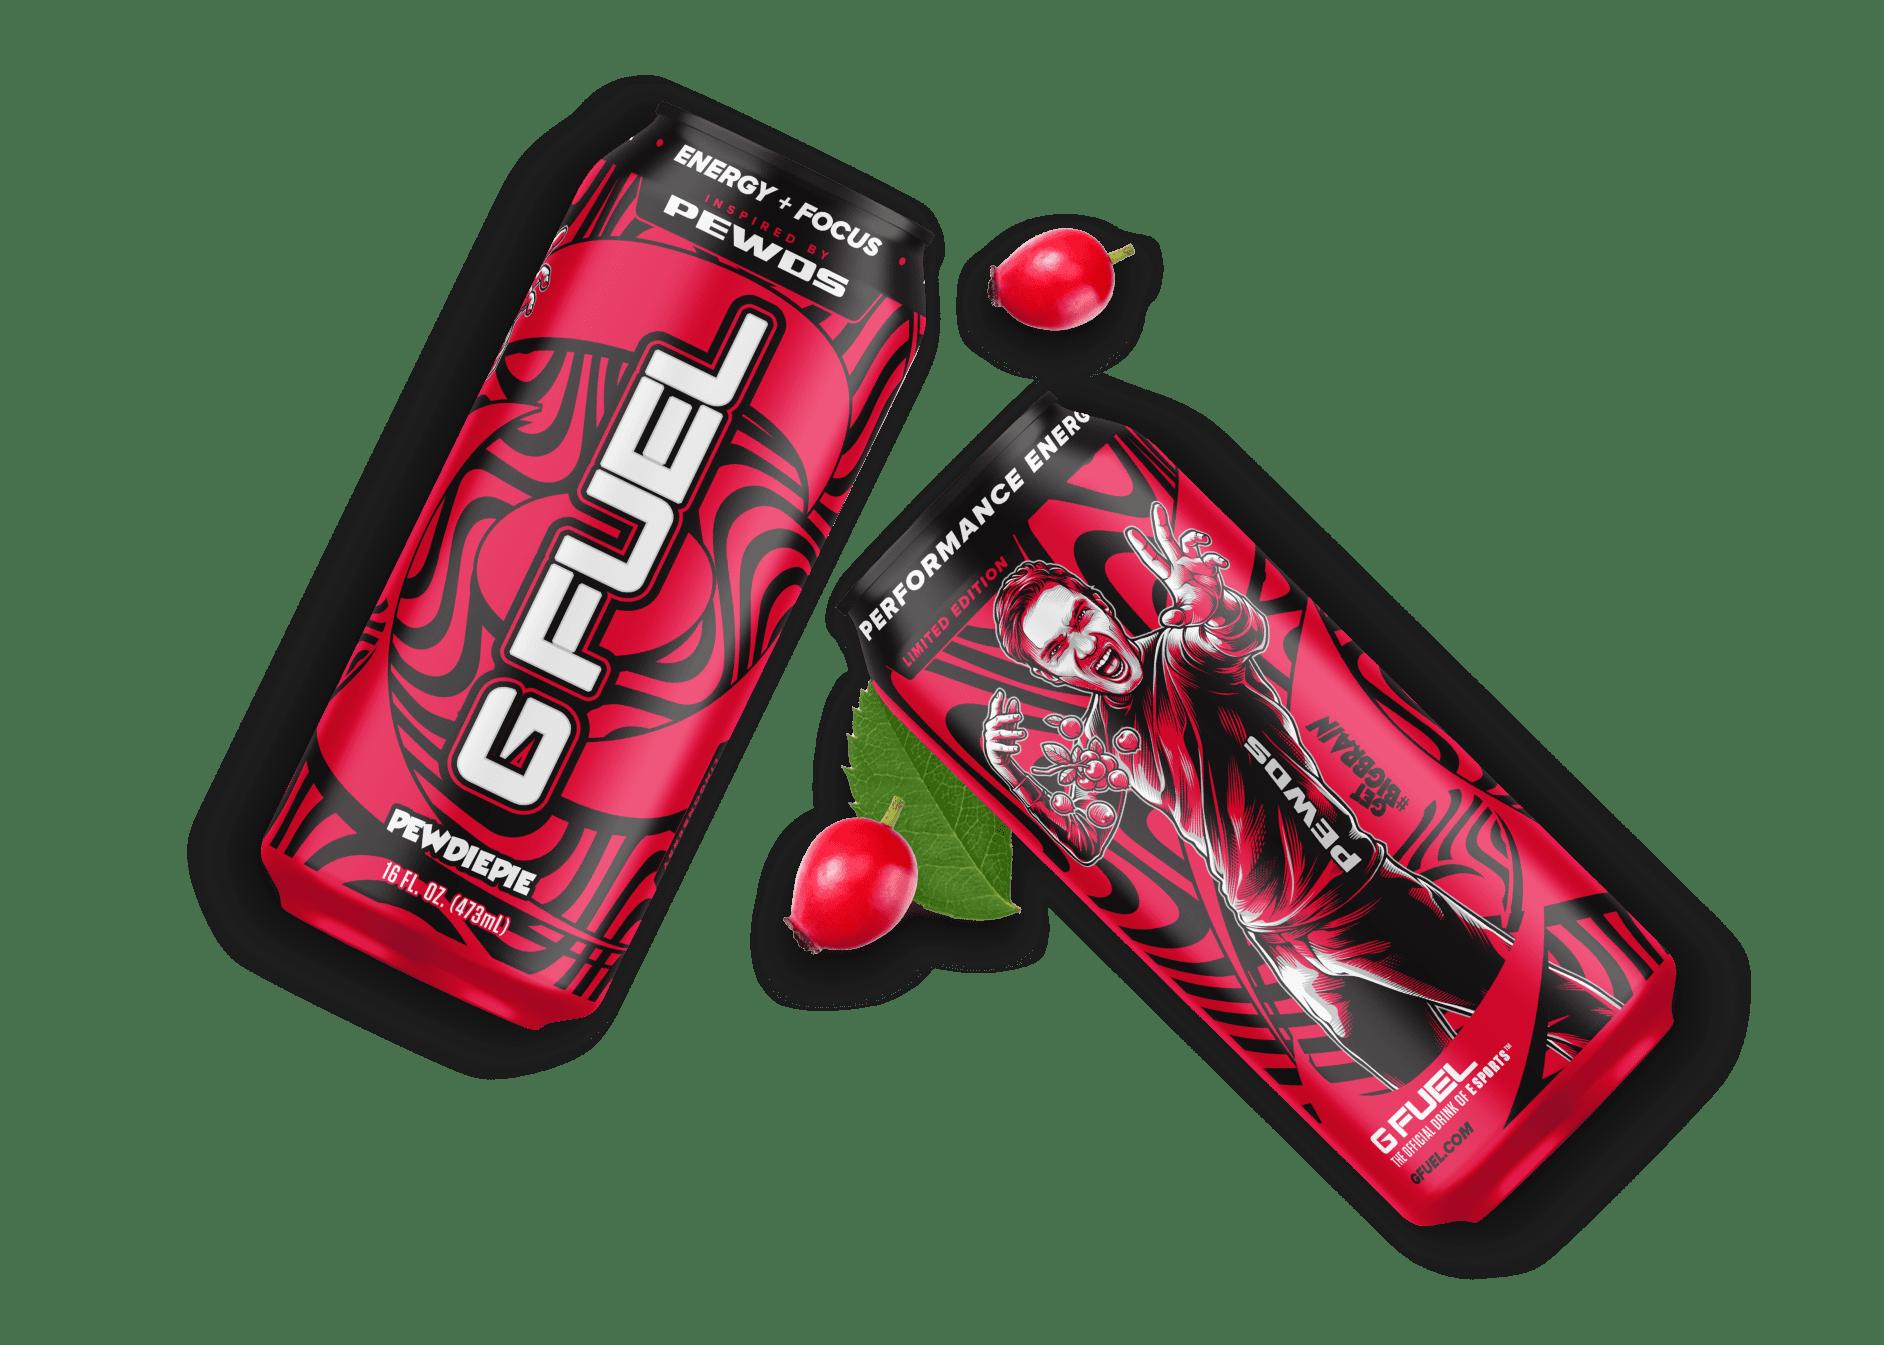 gfuel packaging design